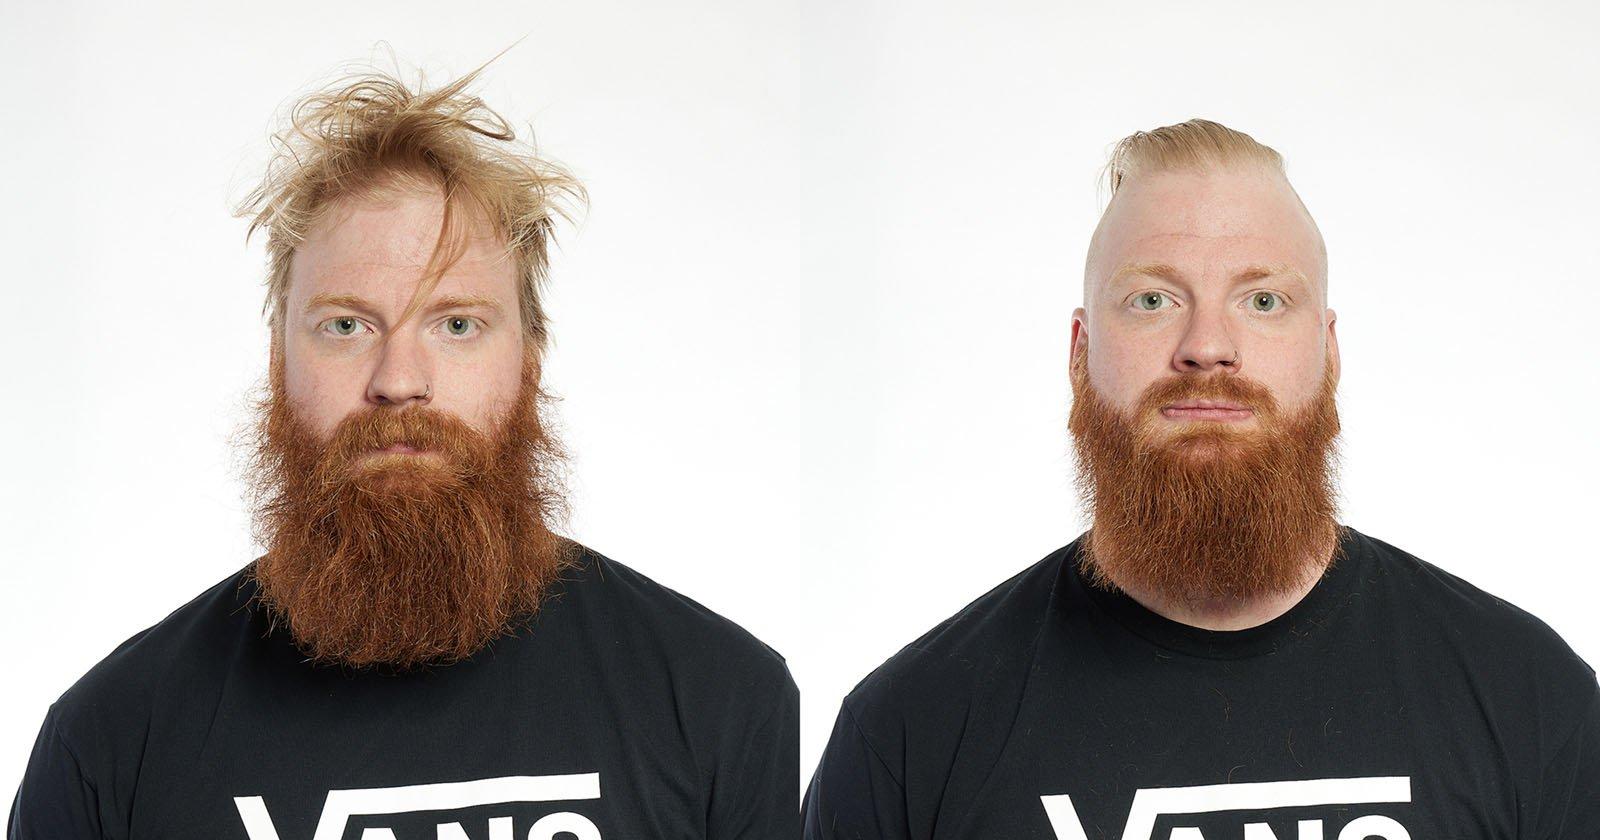 Portraits of Post-Lockdown Haircuts